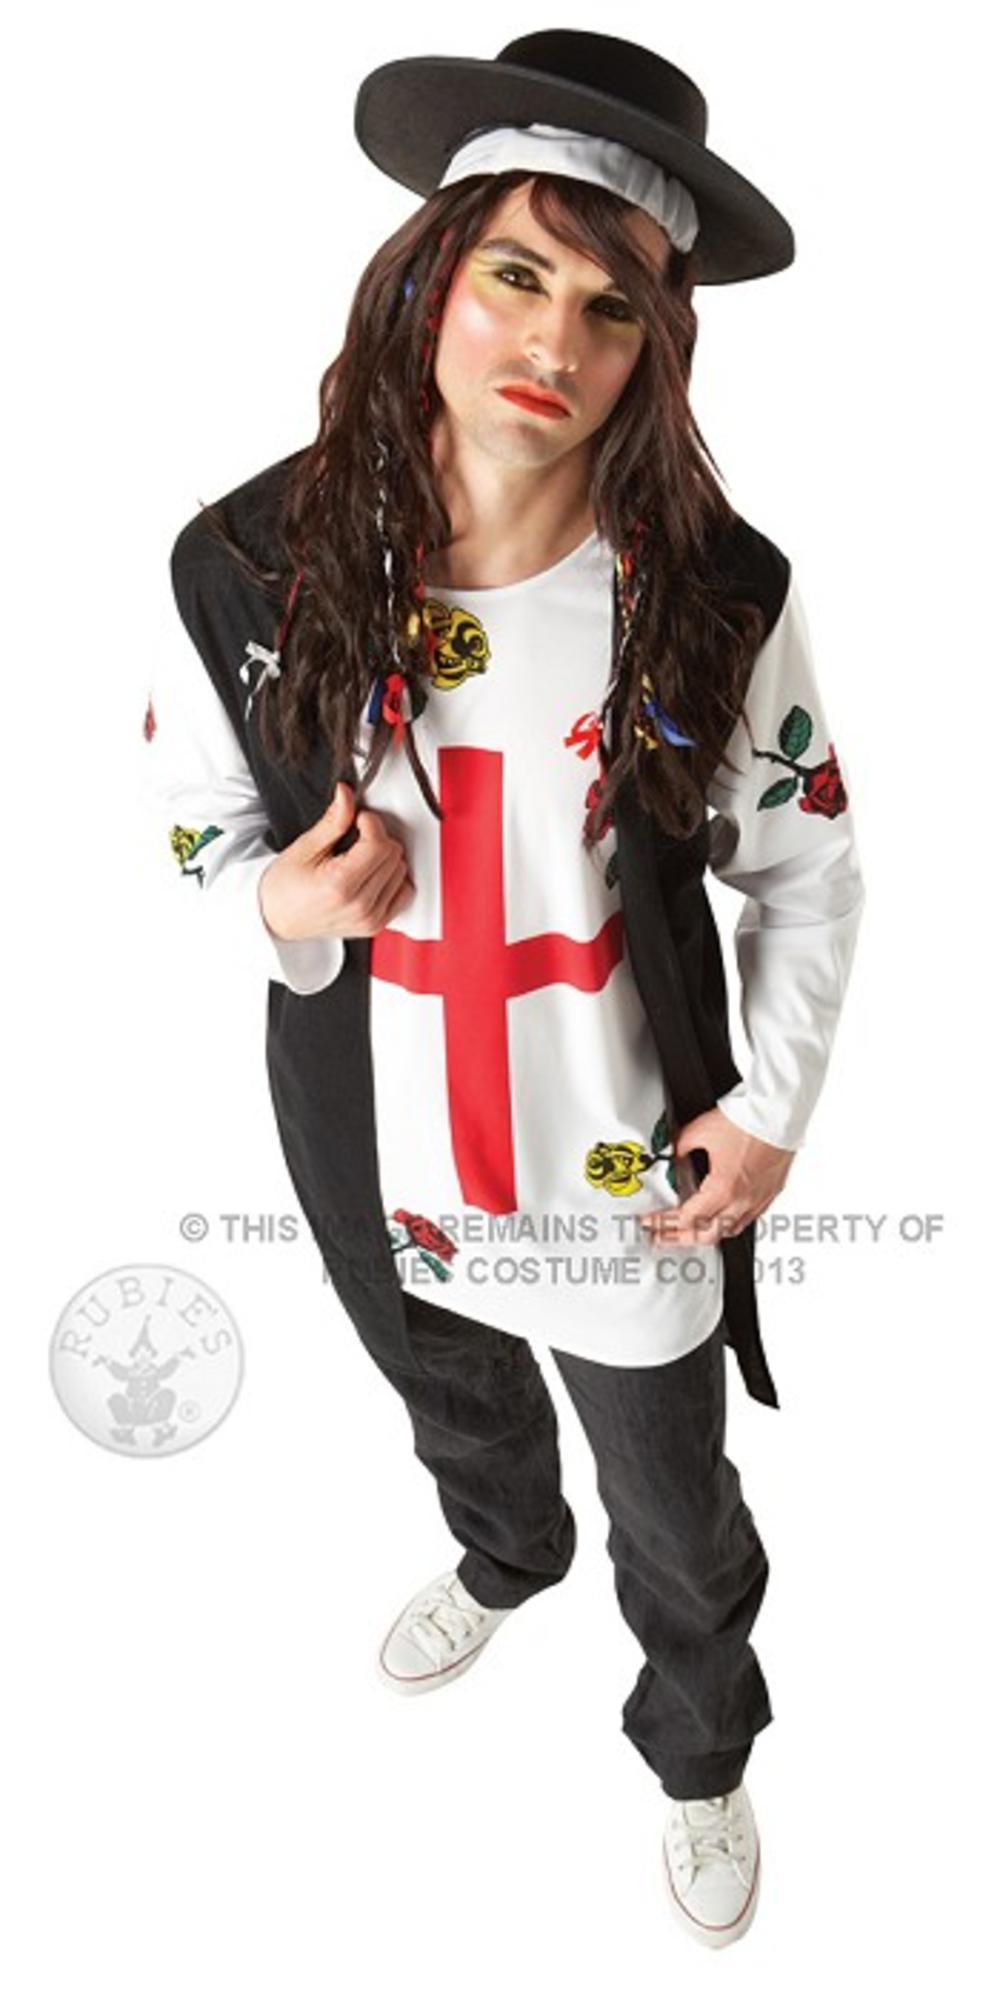 80s New Wave Pop Star Mens Fancy Dress 1980s Boy George Celebrity Adults Costume